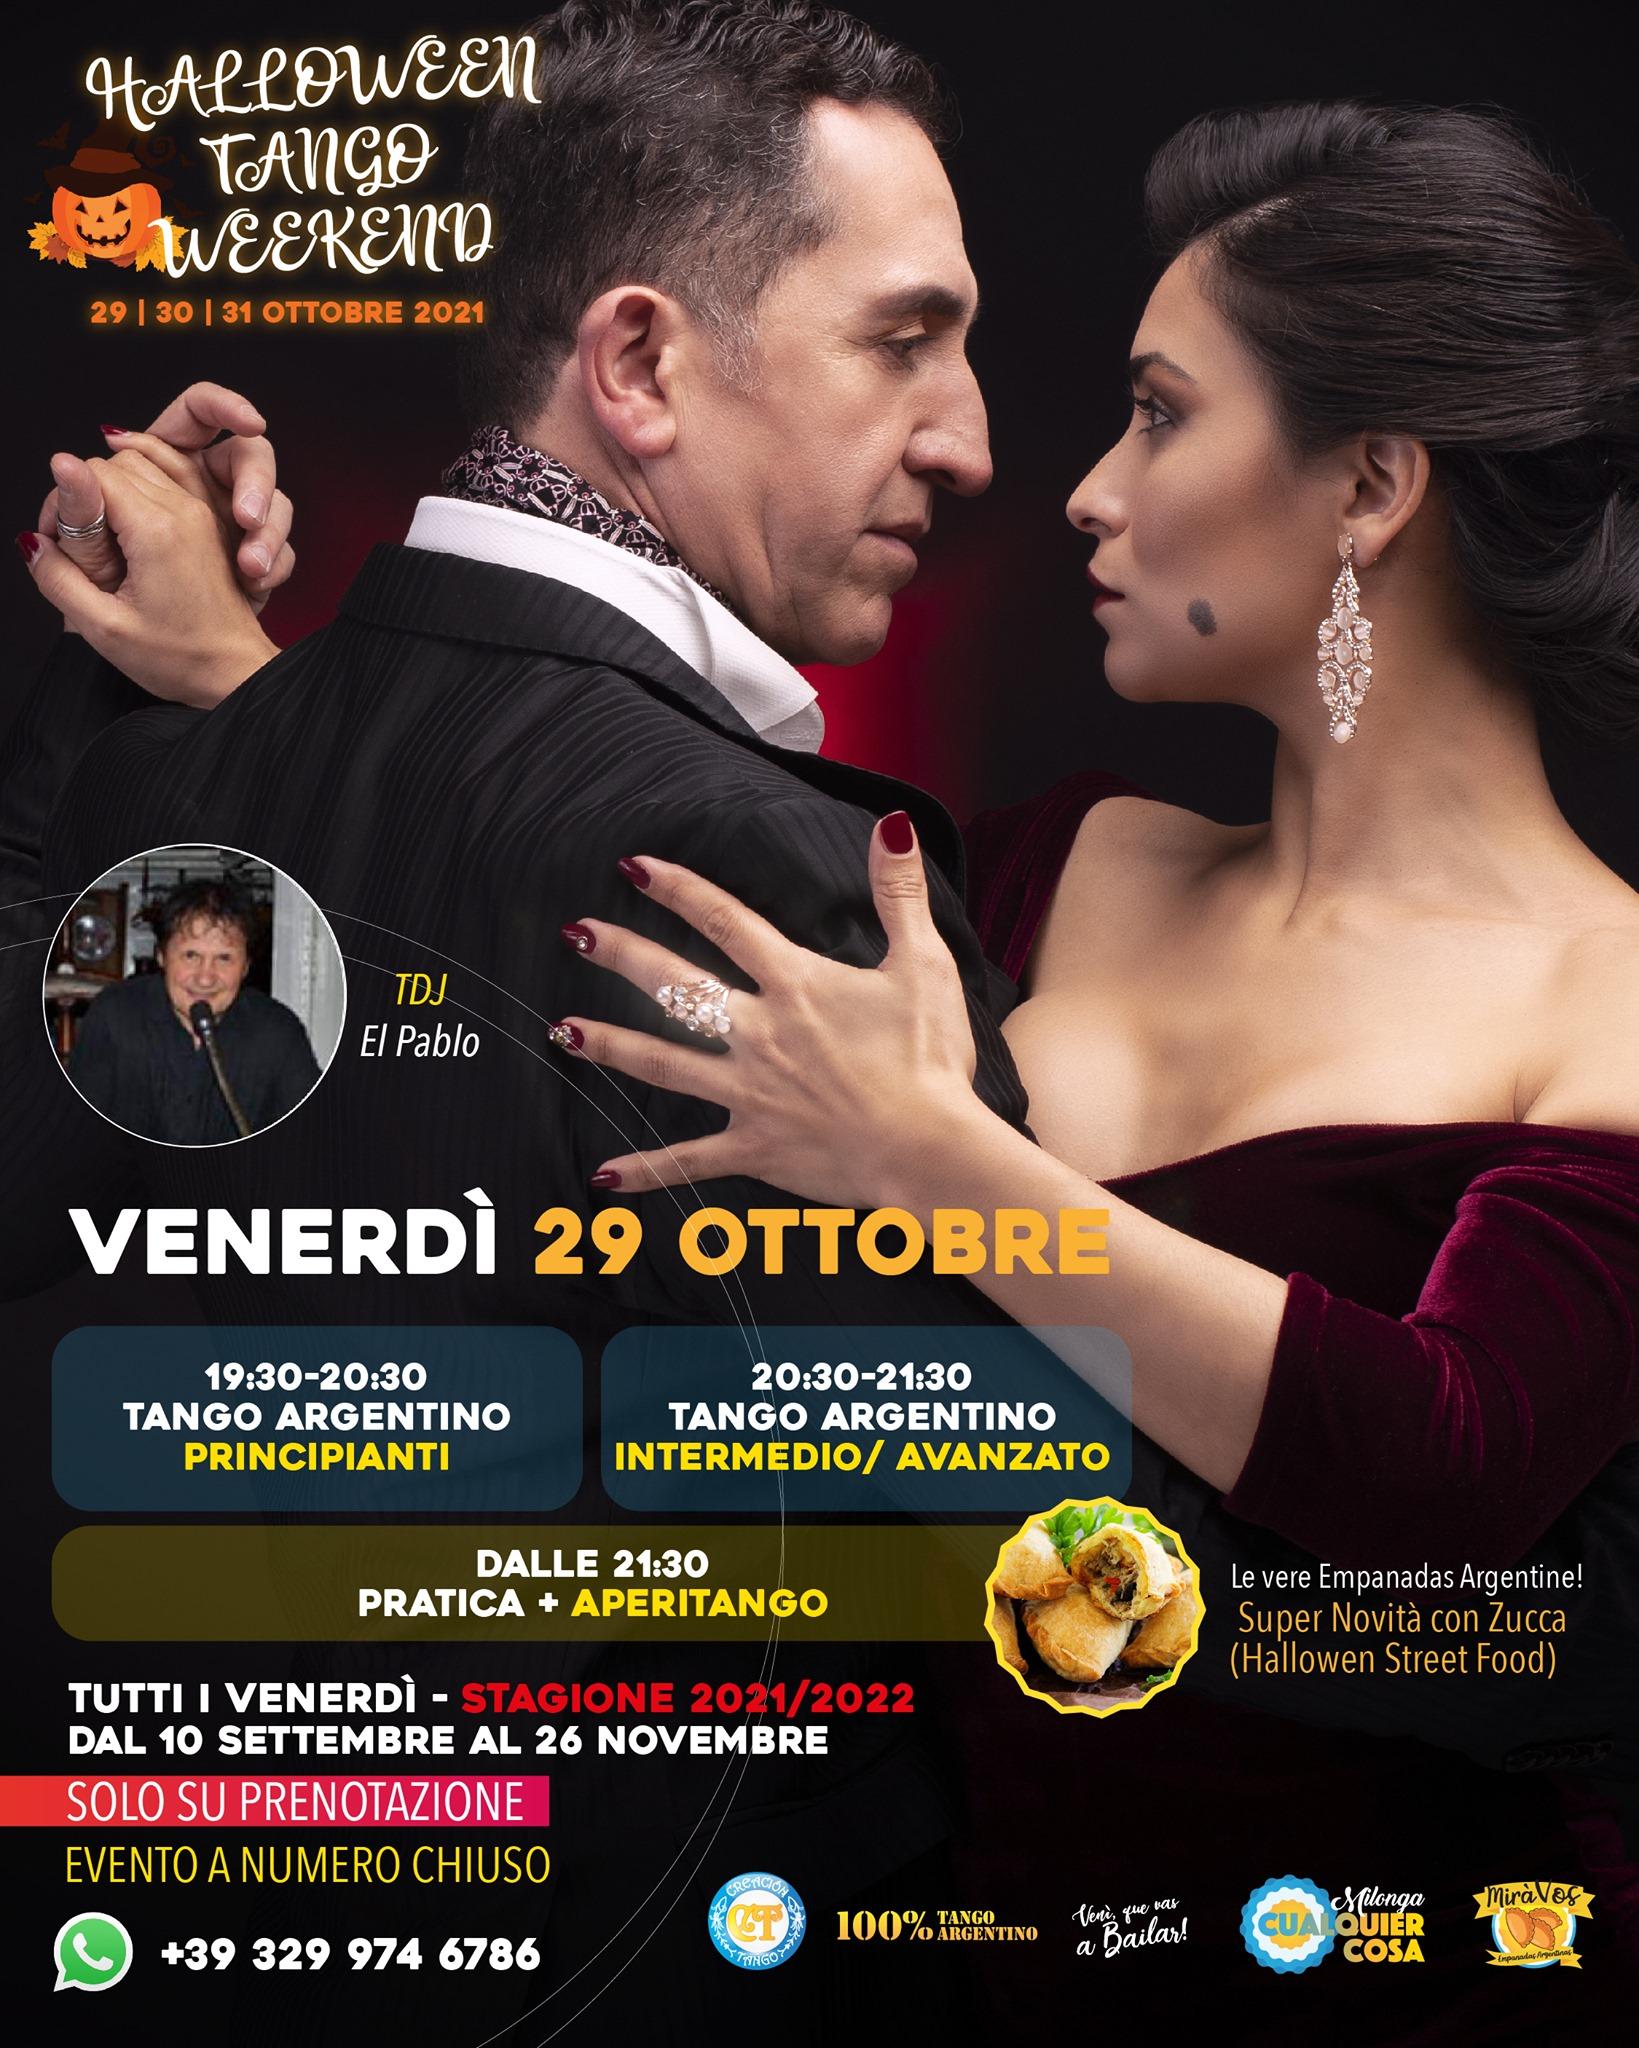 Halloween Tango Weekend 29, 30, 31 Ottobre!